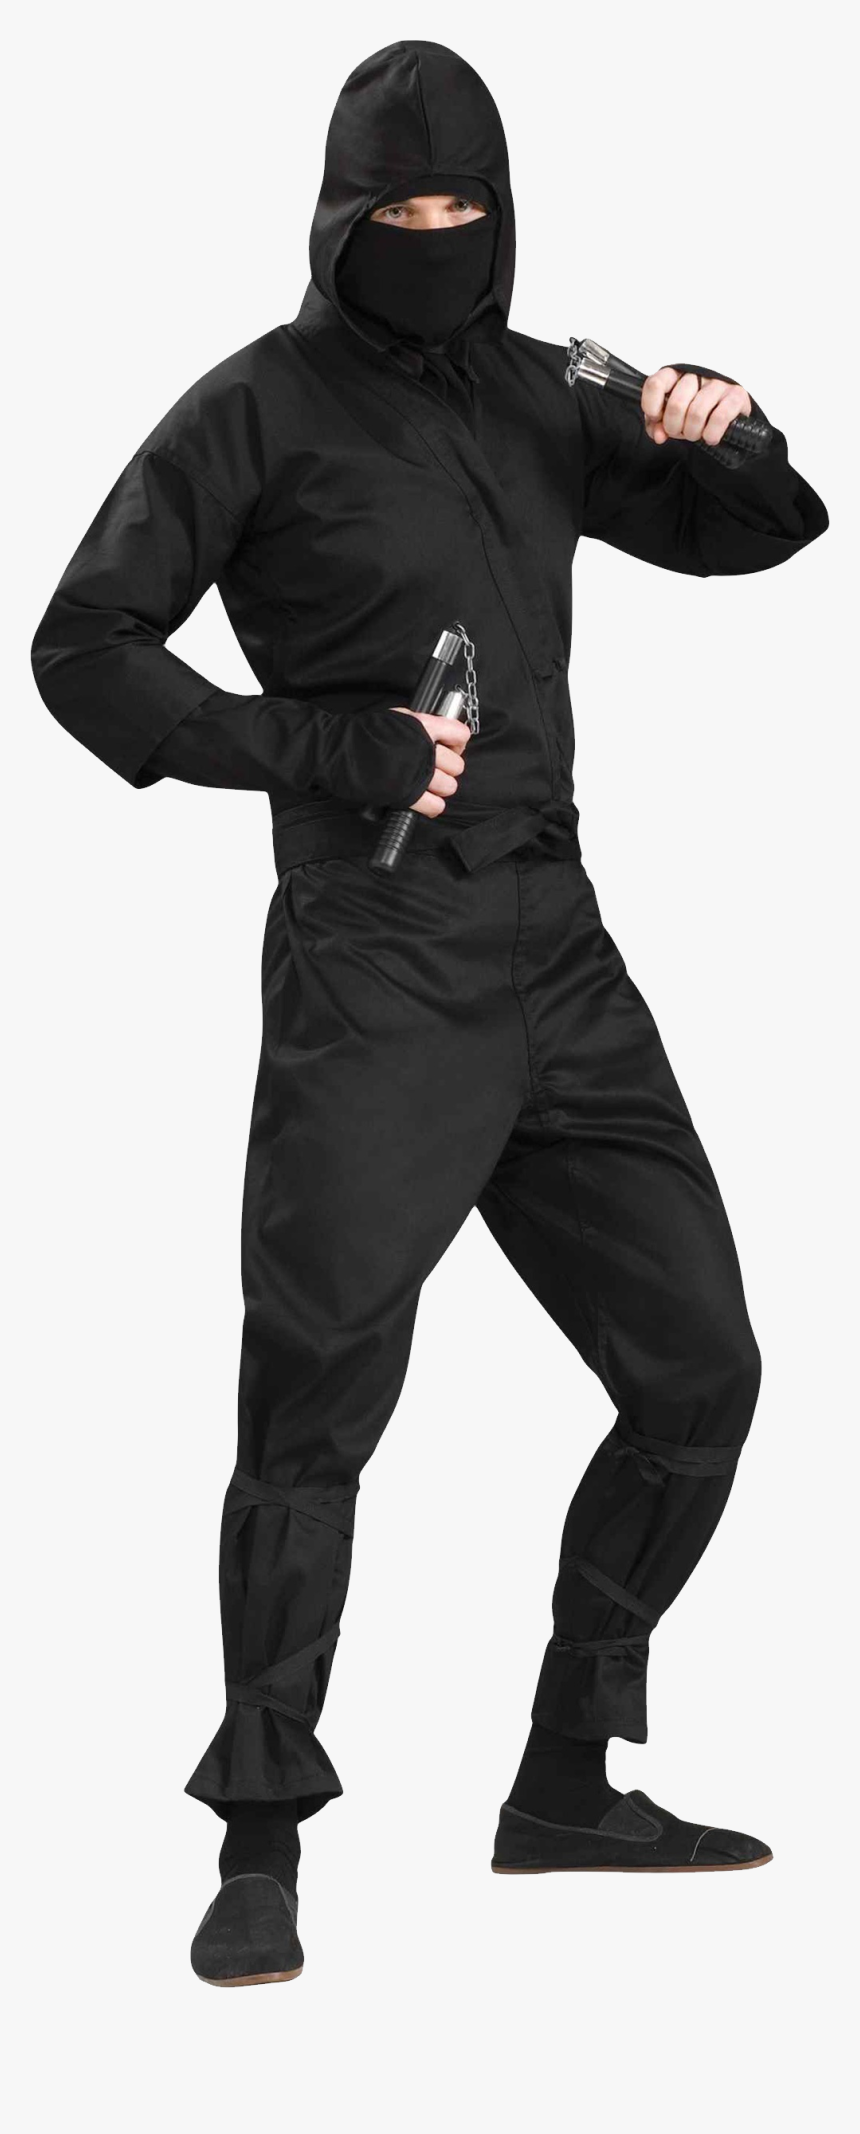 Ninja Png - Mens Ninja Halloween Costume, Transparent Png, Free Download